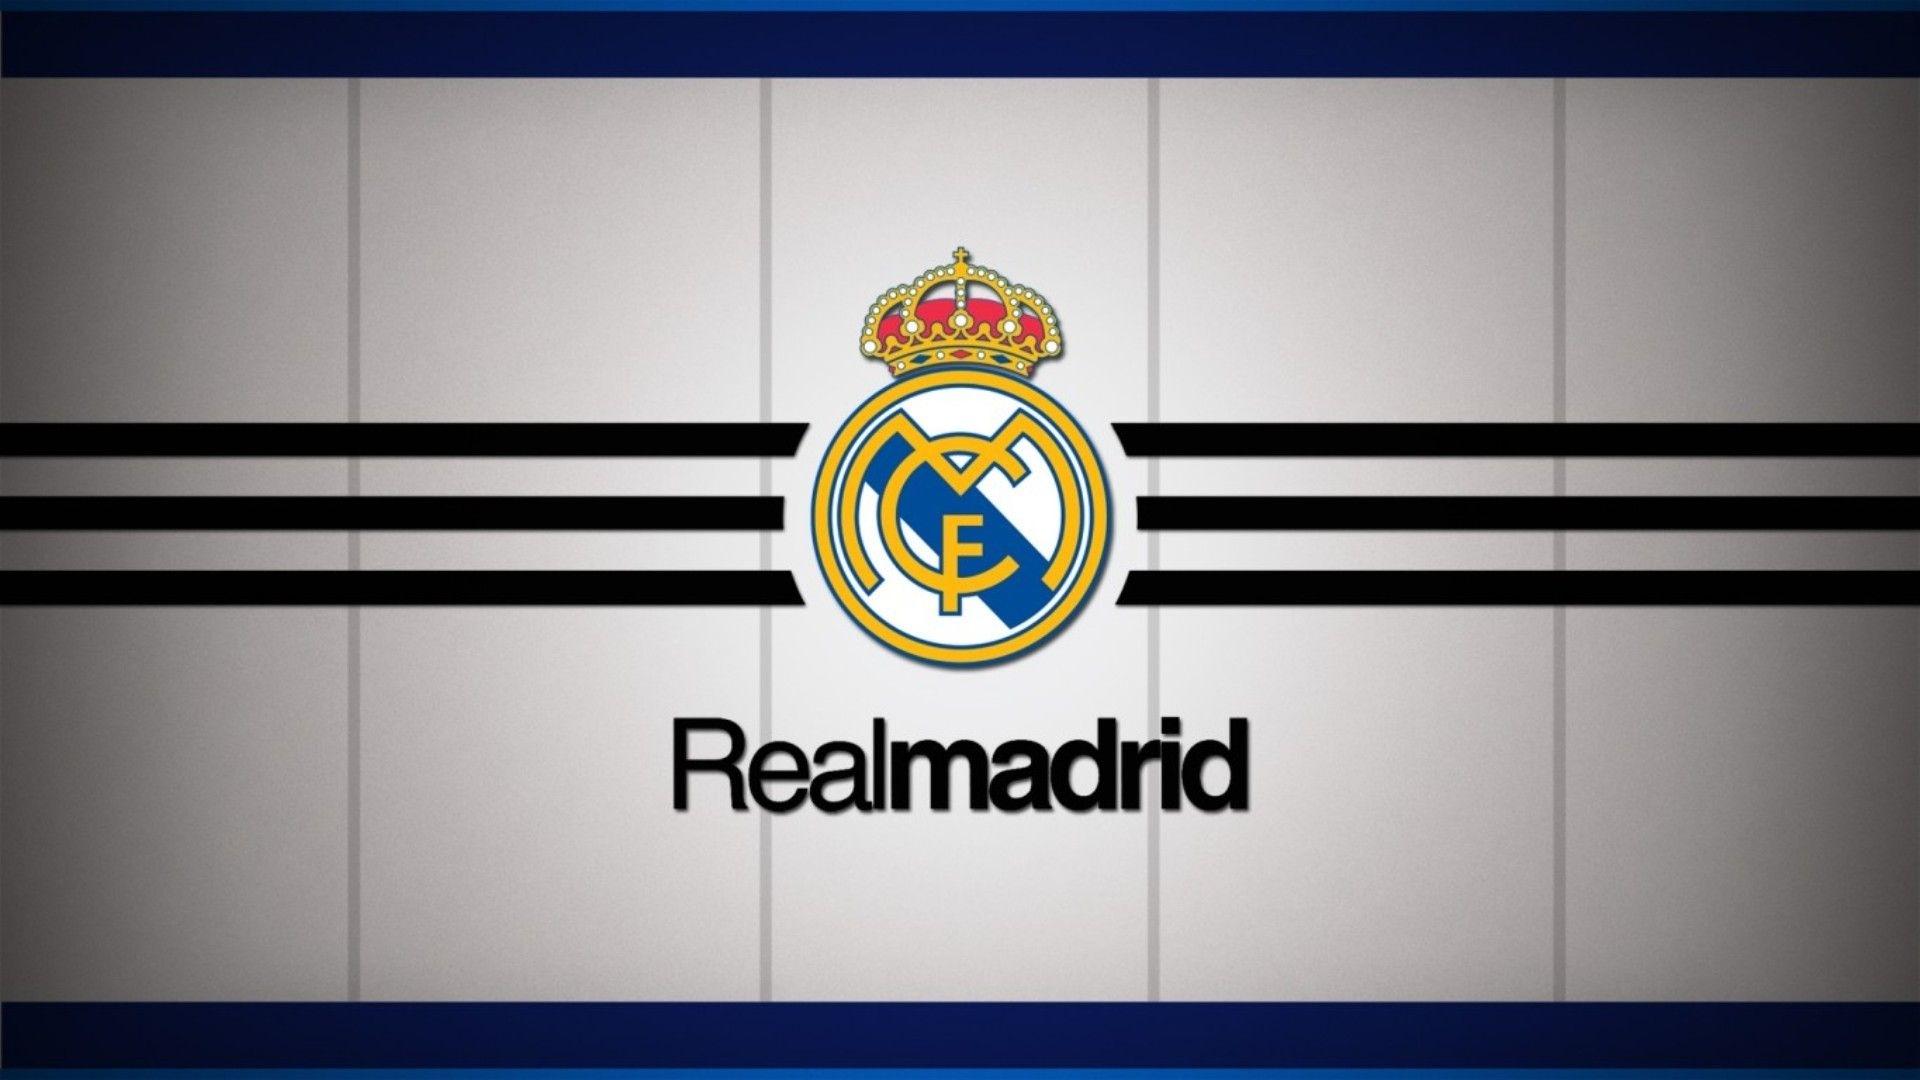 real madrid logo wallpaper 1080p | real madrid | pinterest